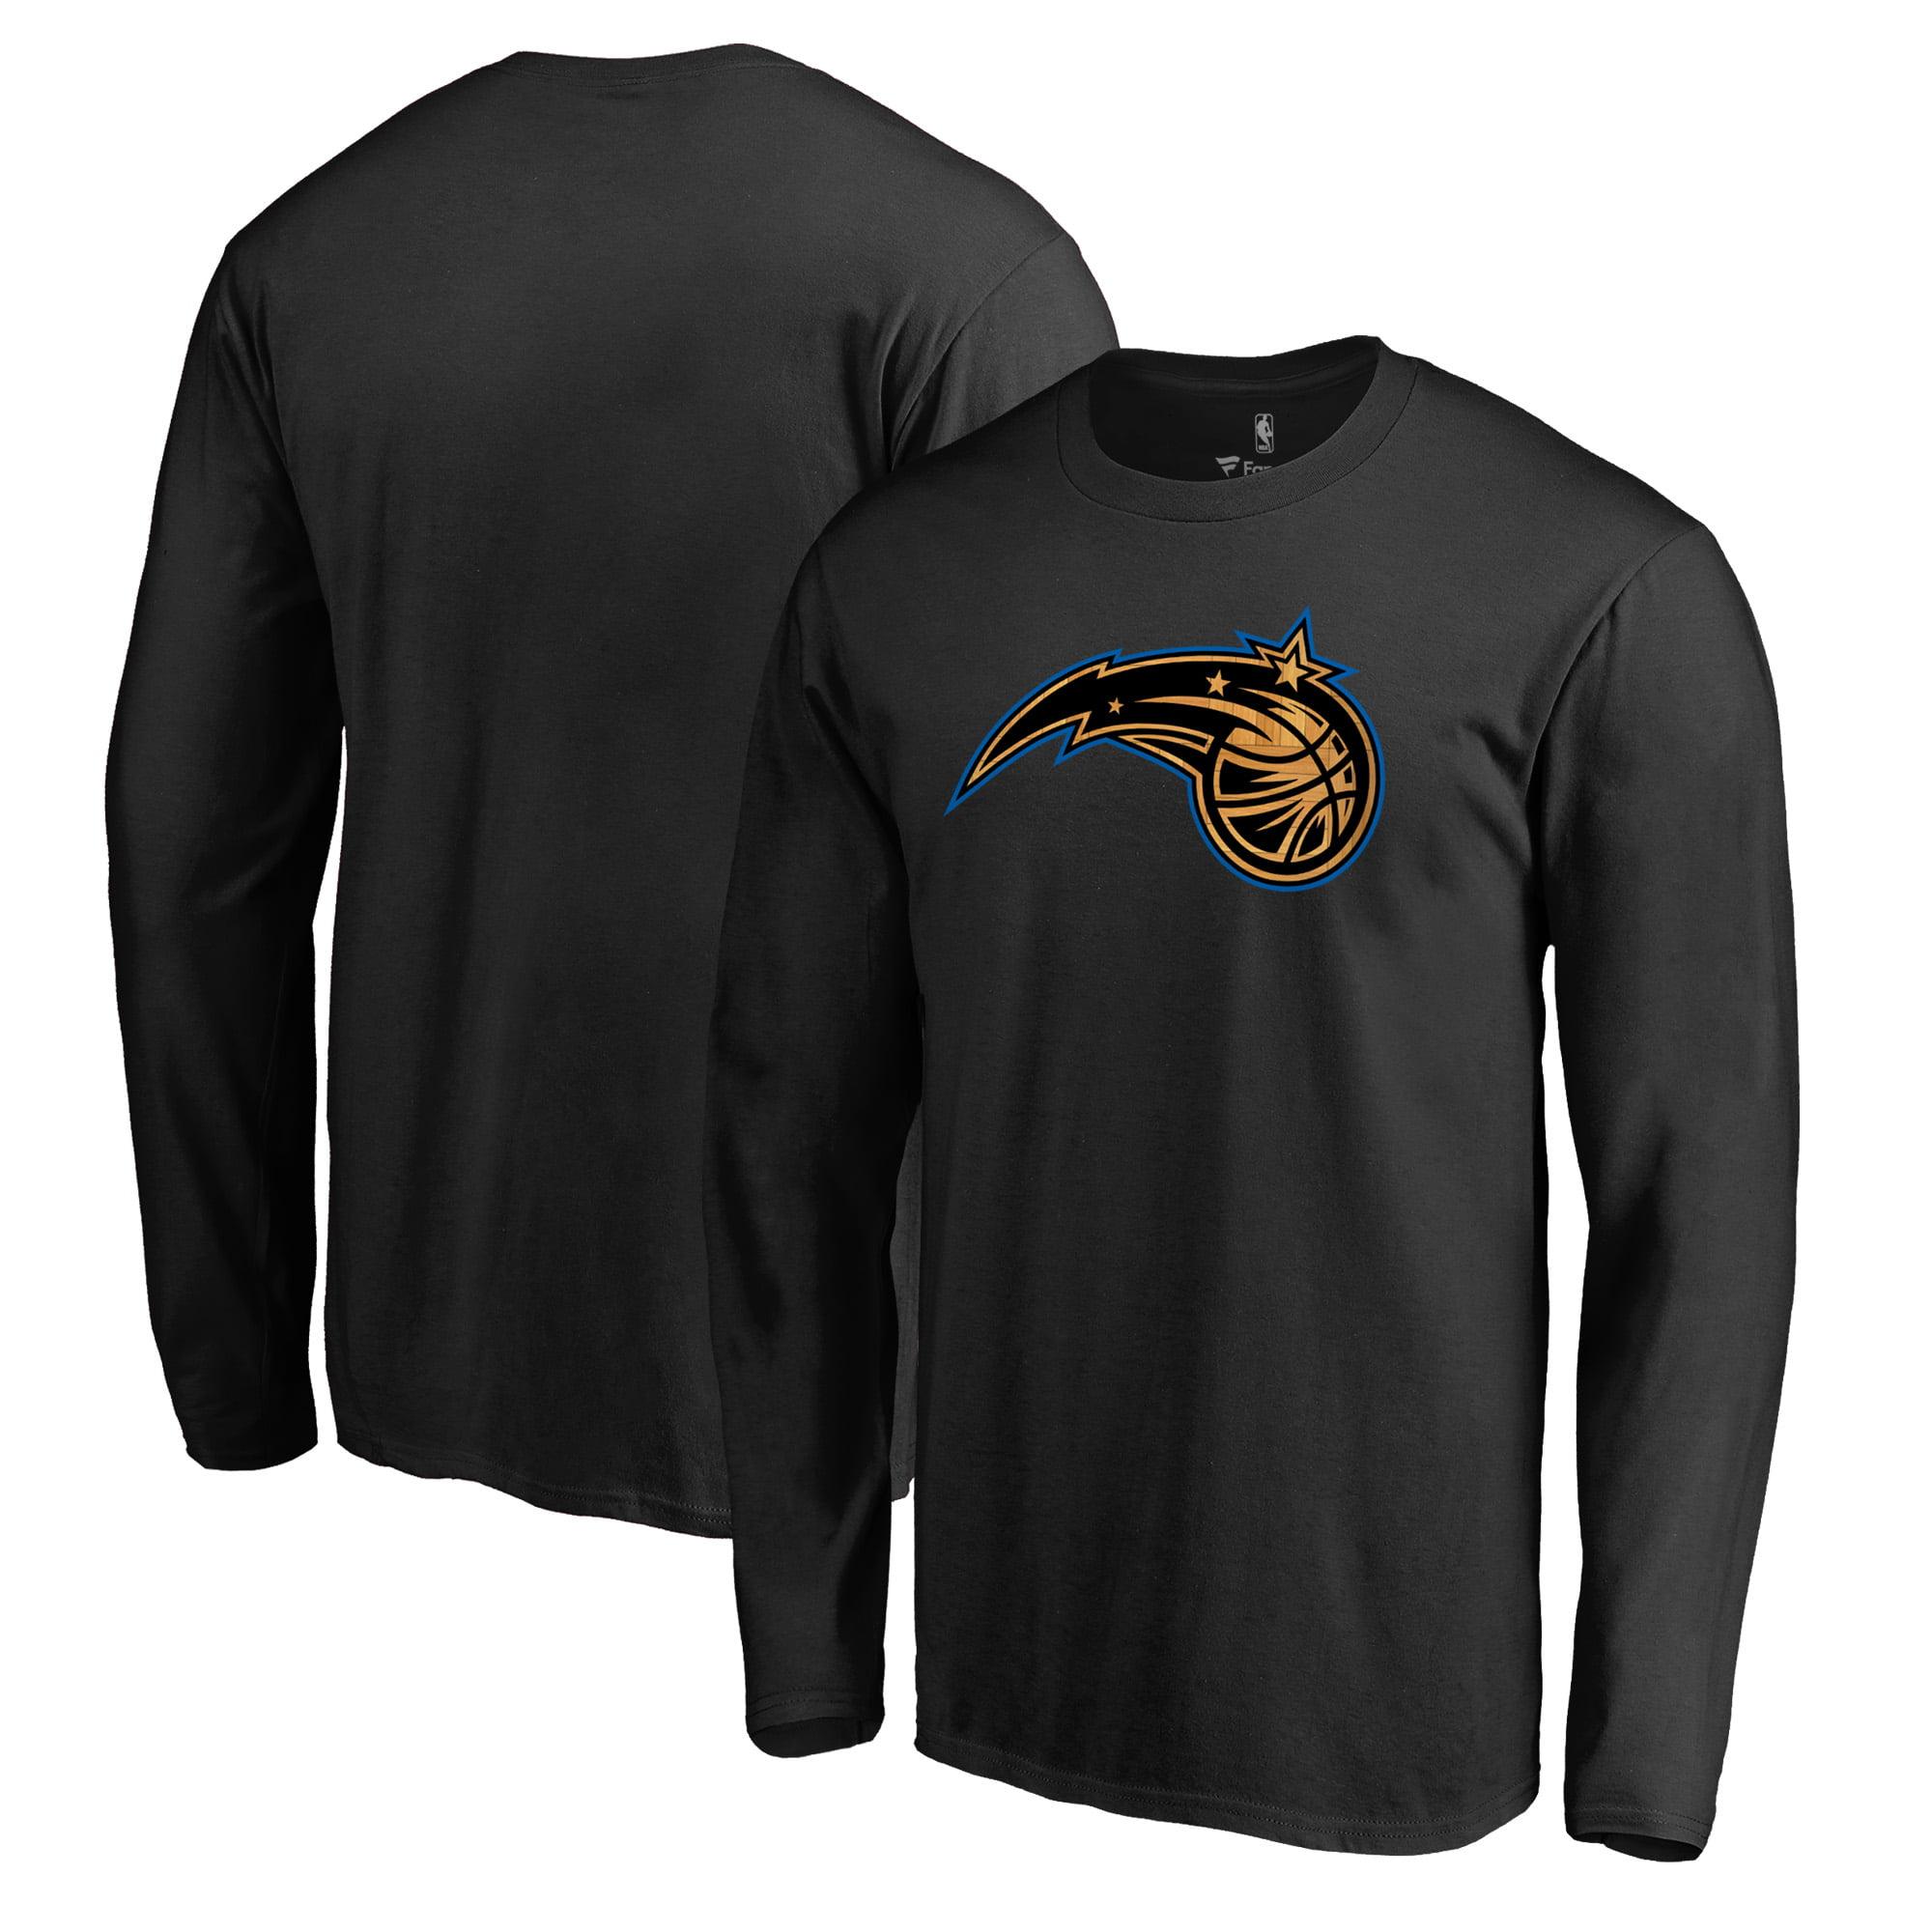 Orlando Magic Fanatics Branded Hardwood Long Sleeve T-Shirt - Black